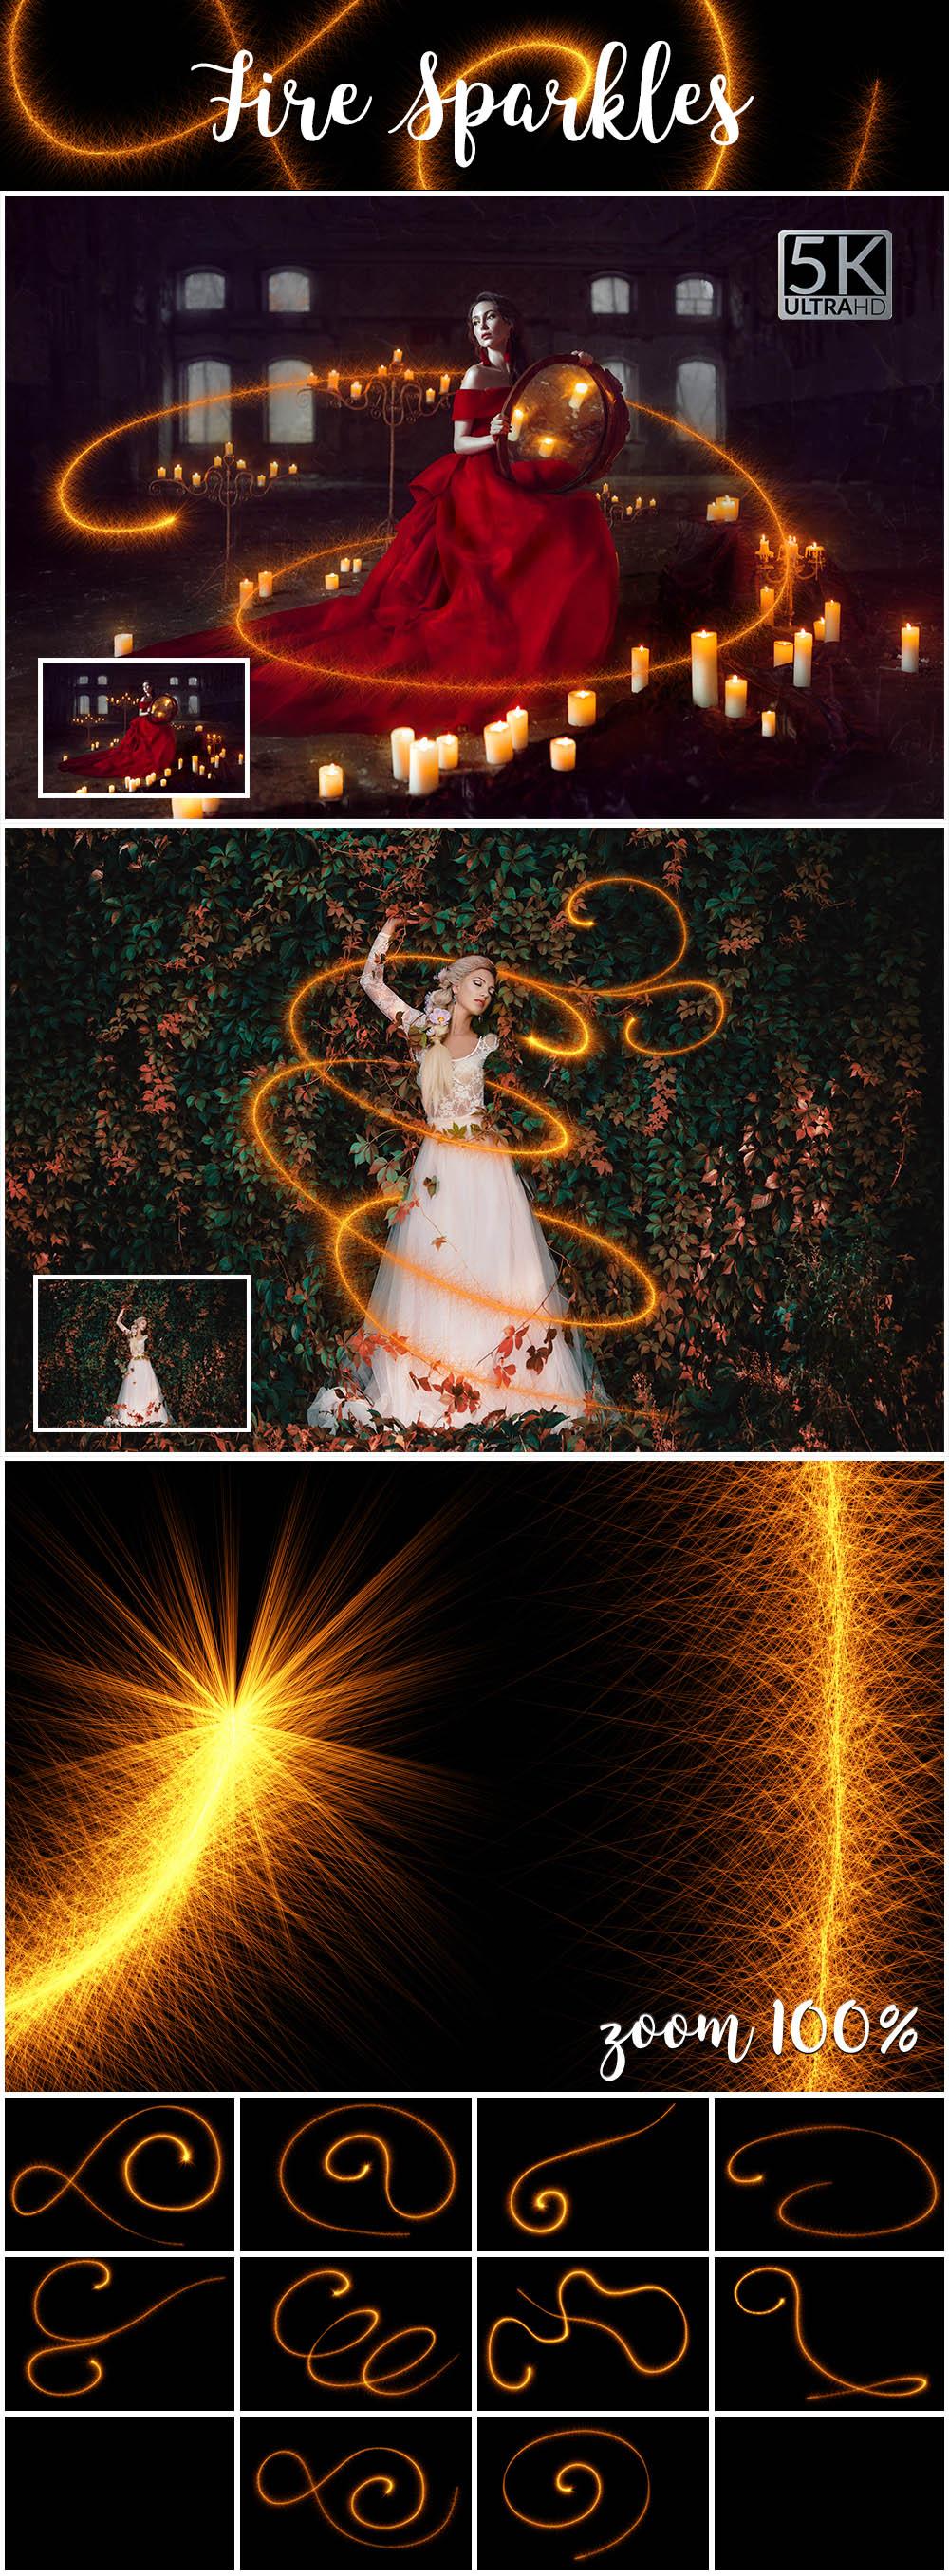 5 - Fire Sparkles